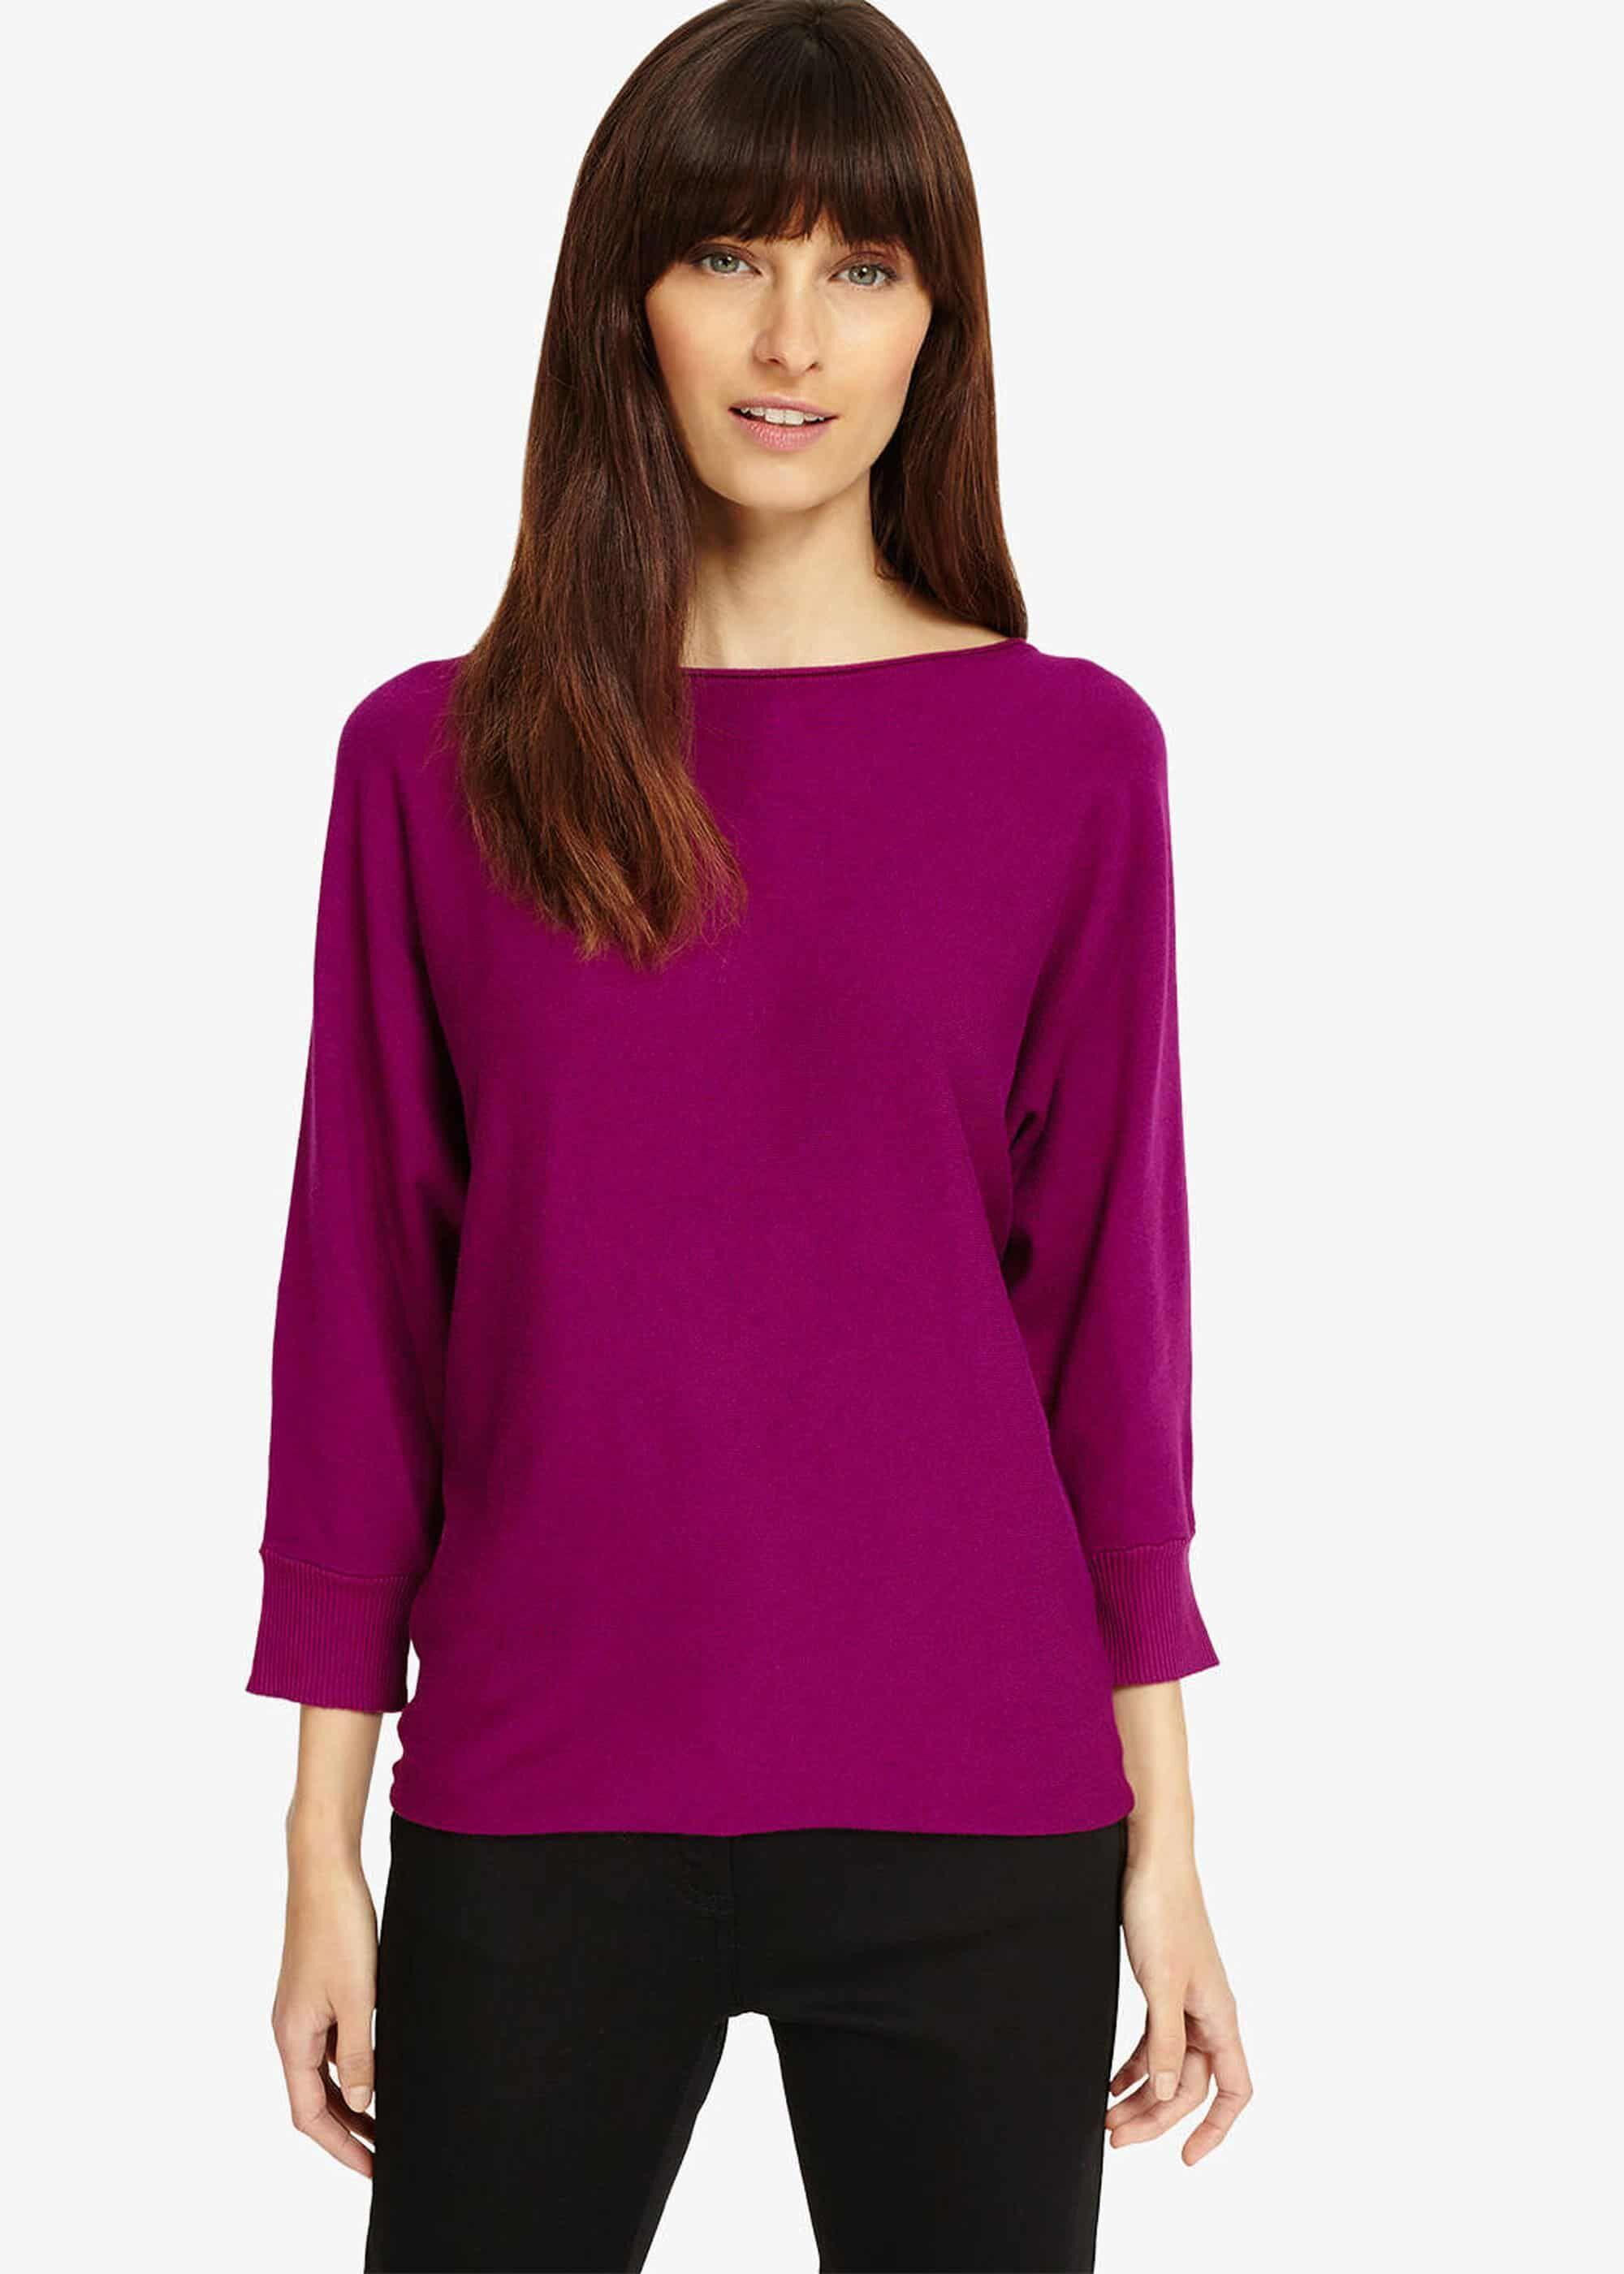 b6ac77b1606 Women's Purple Becca Smart Batwing Knitted Jumper